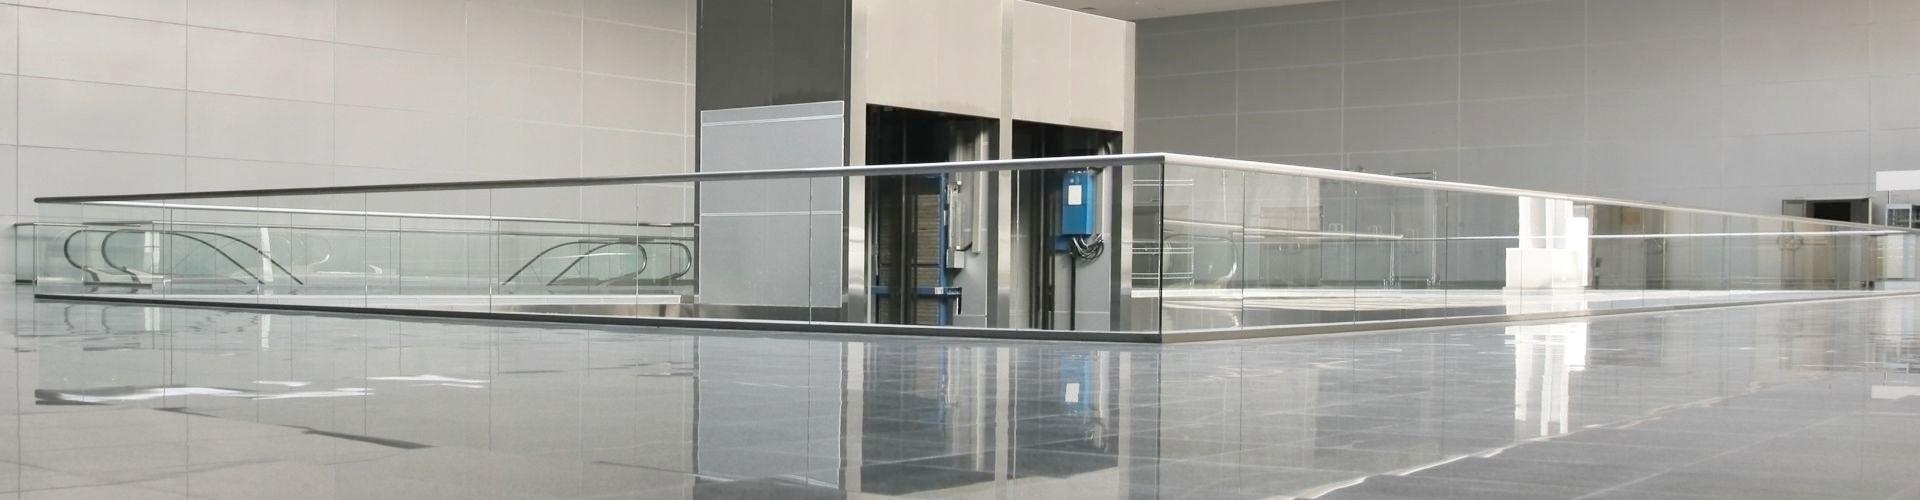 balustrada szklana samonośna